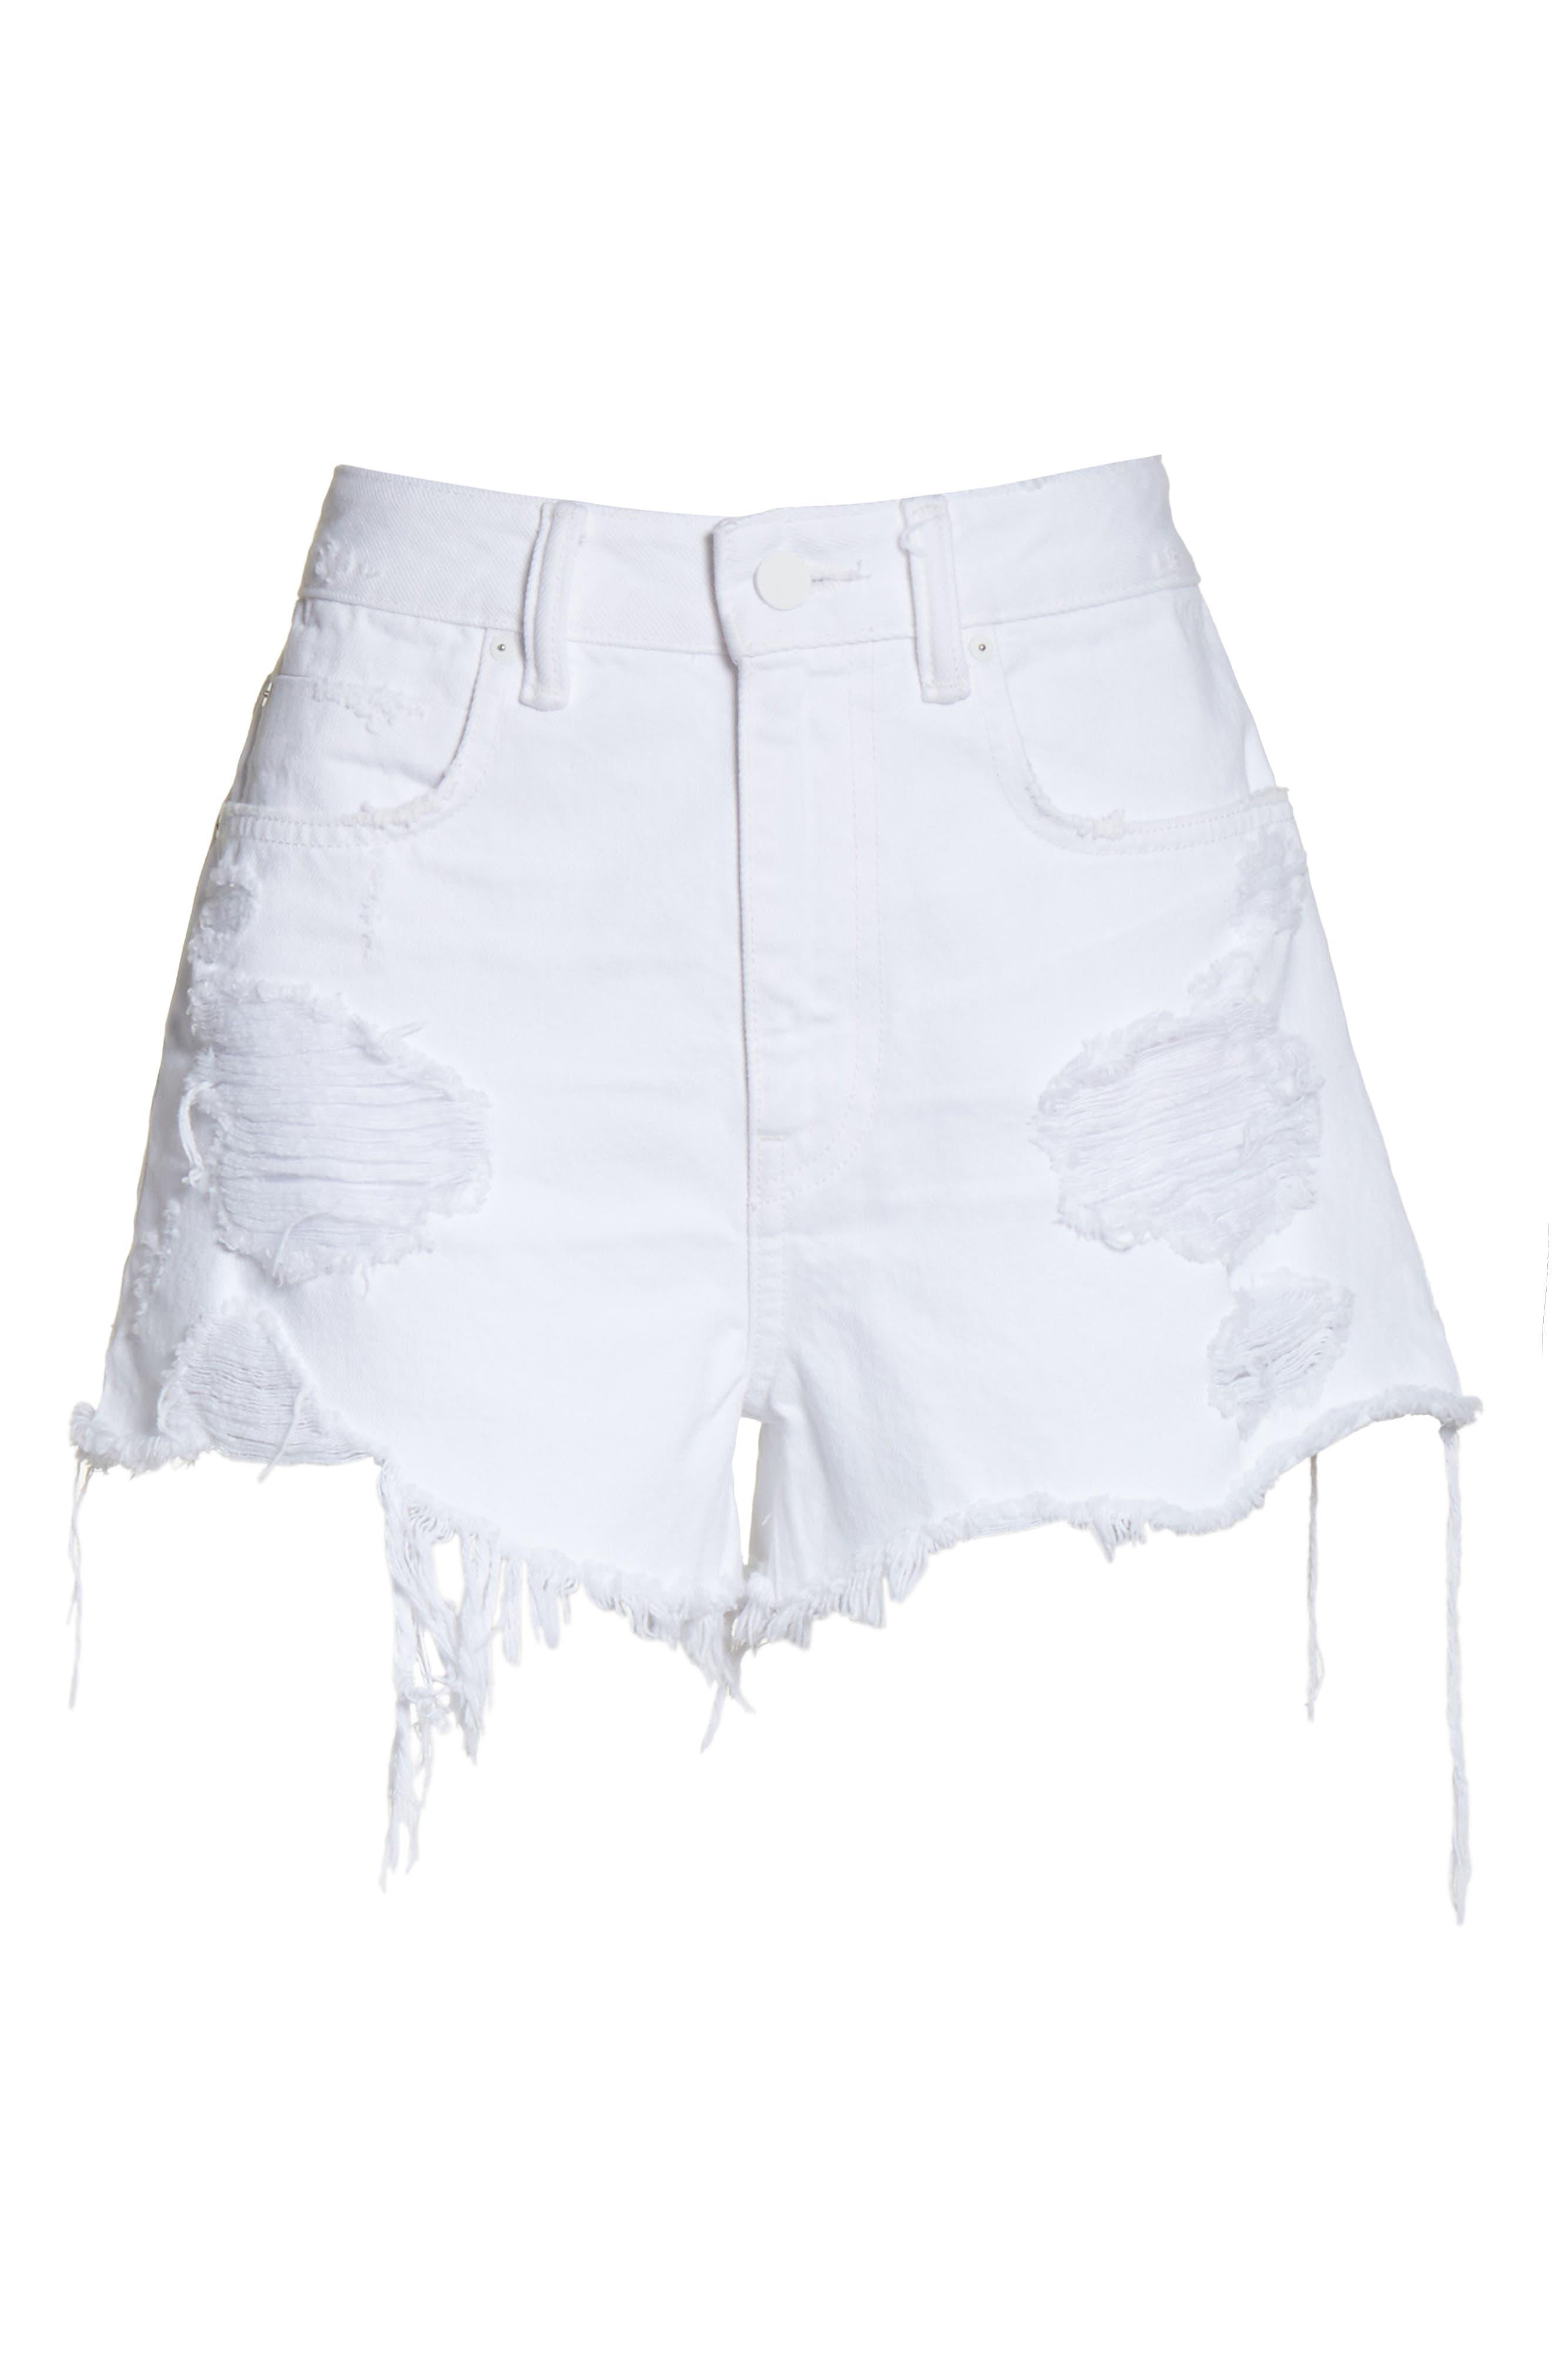 Bite White Ripped Denim Shorts,                             Alternate thumbnail 6, color,